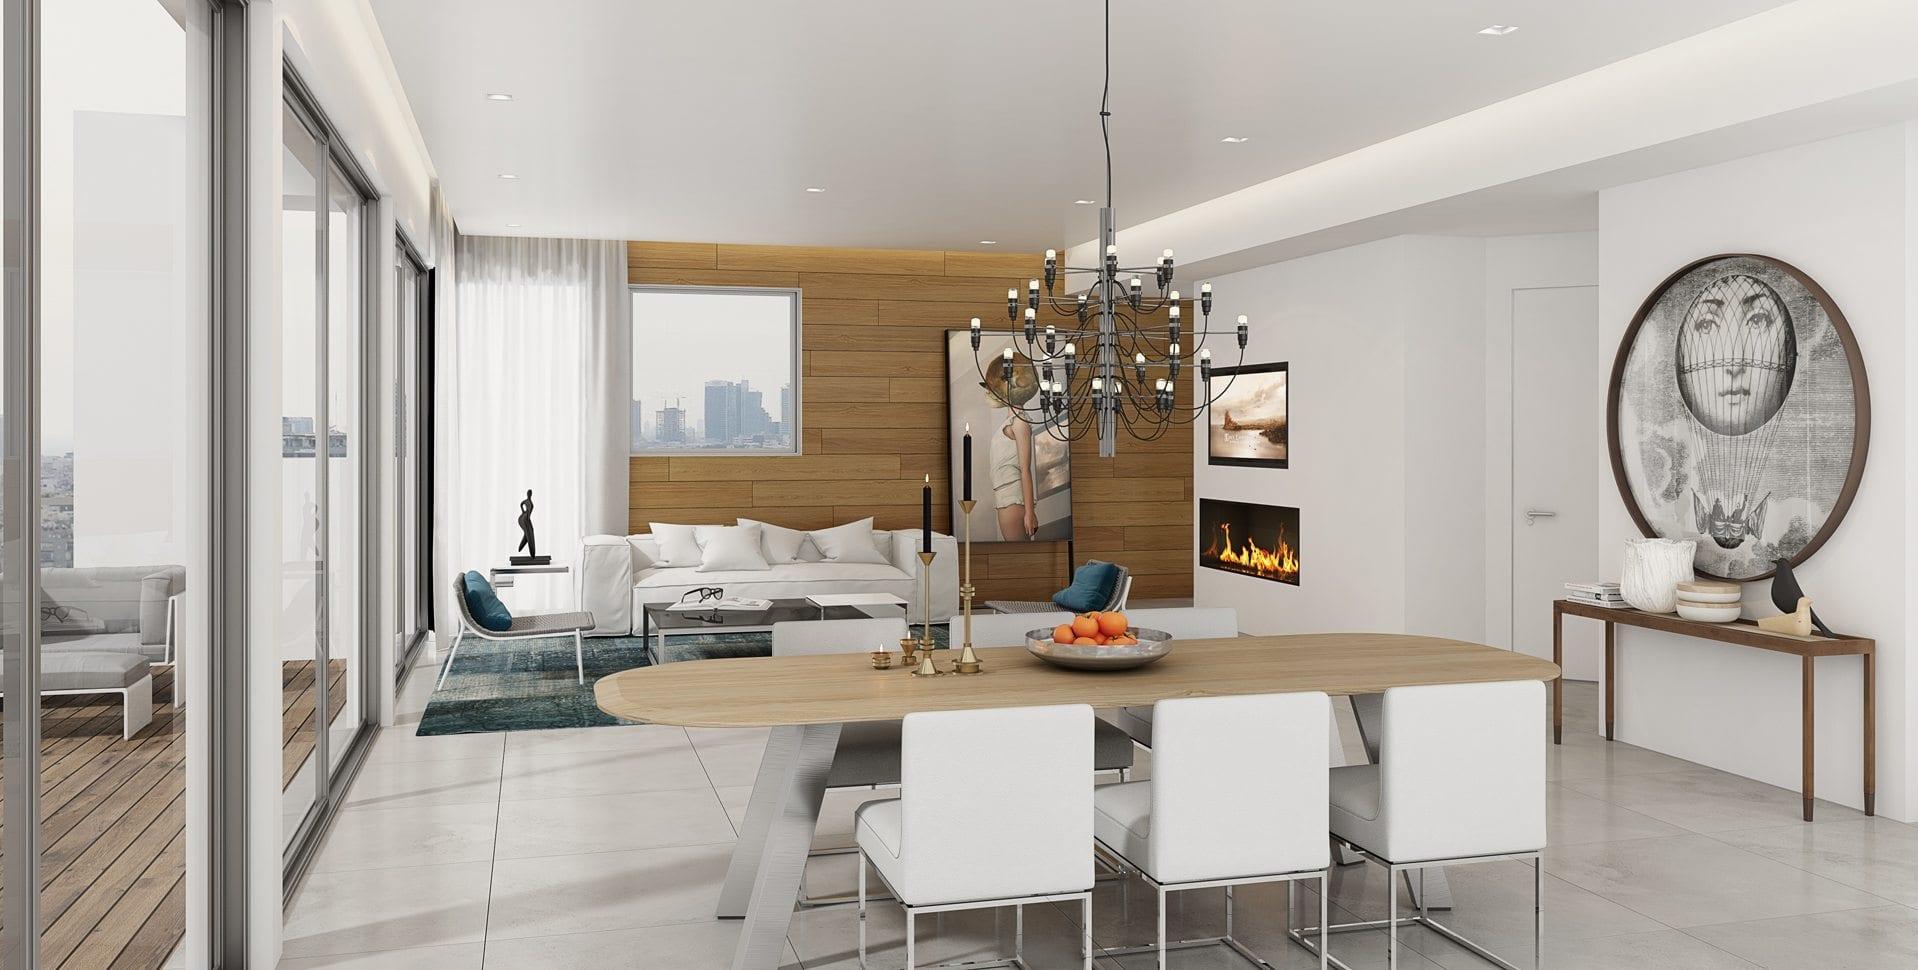 Maayan-Golan_Architectural-Visualization_ penthouse-interior-visualization_living-room_design-Lior Reuter_04